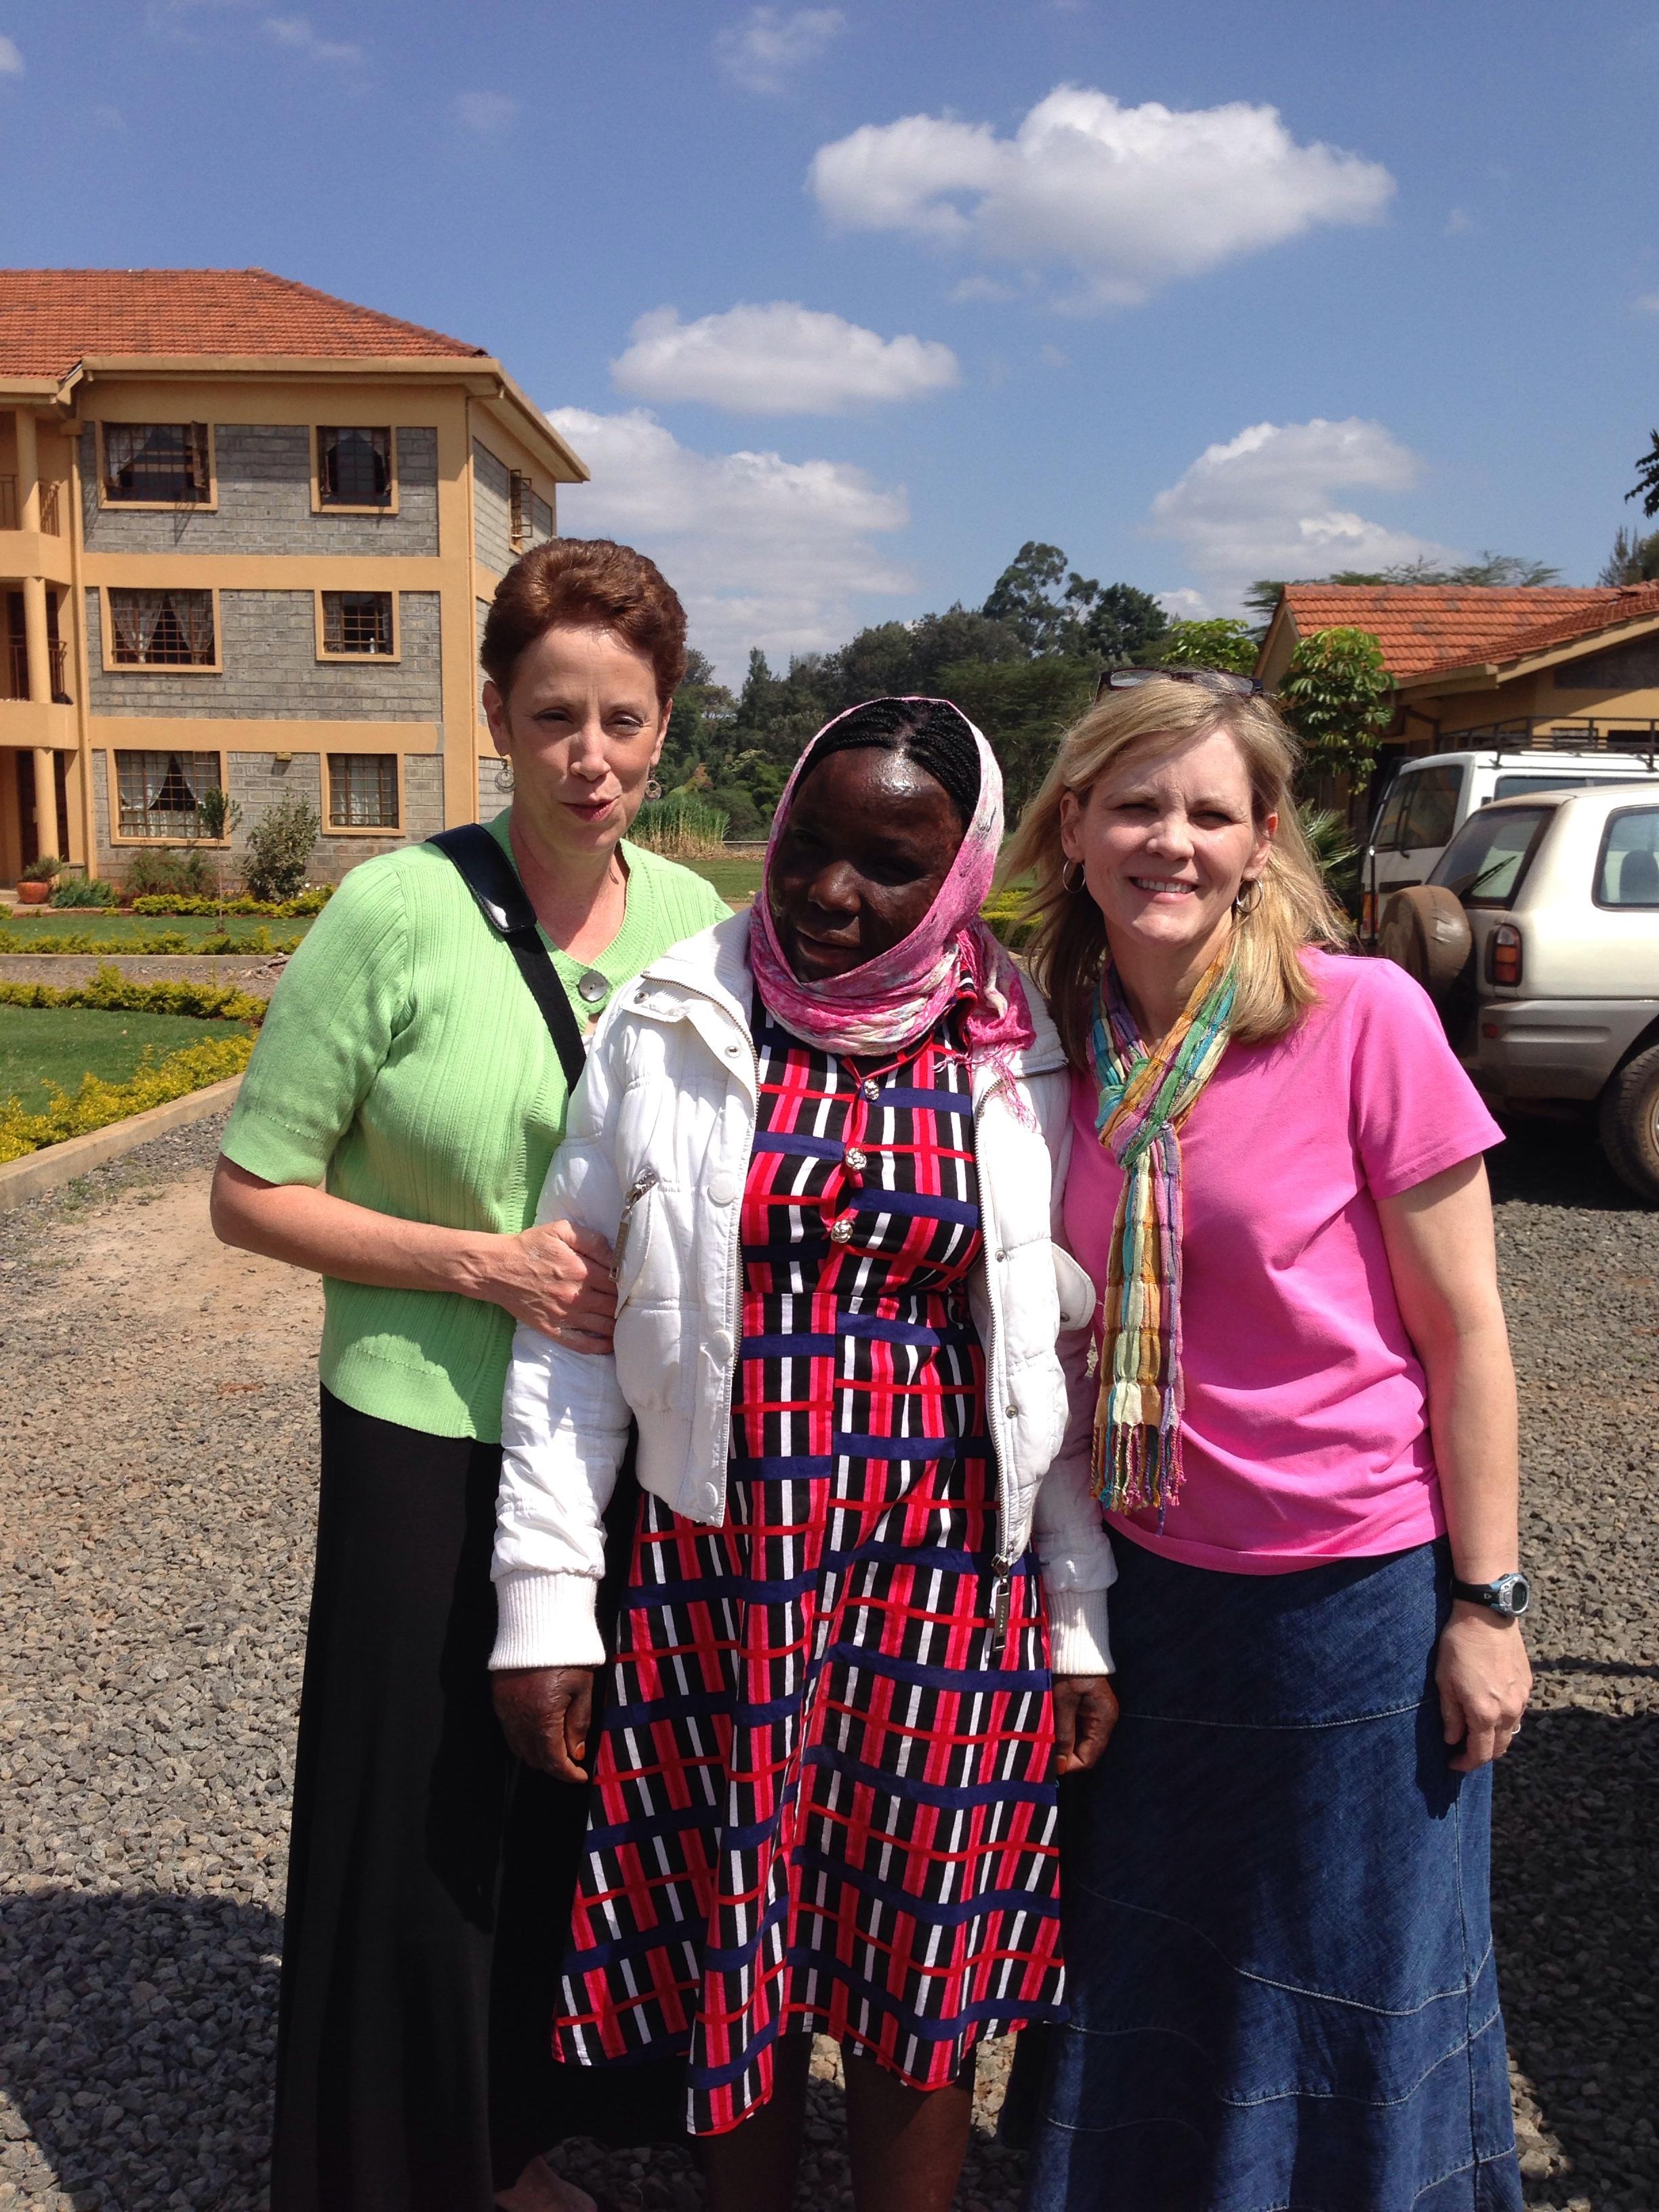 Our dear friend Agnes who we met 7 yrs ago.